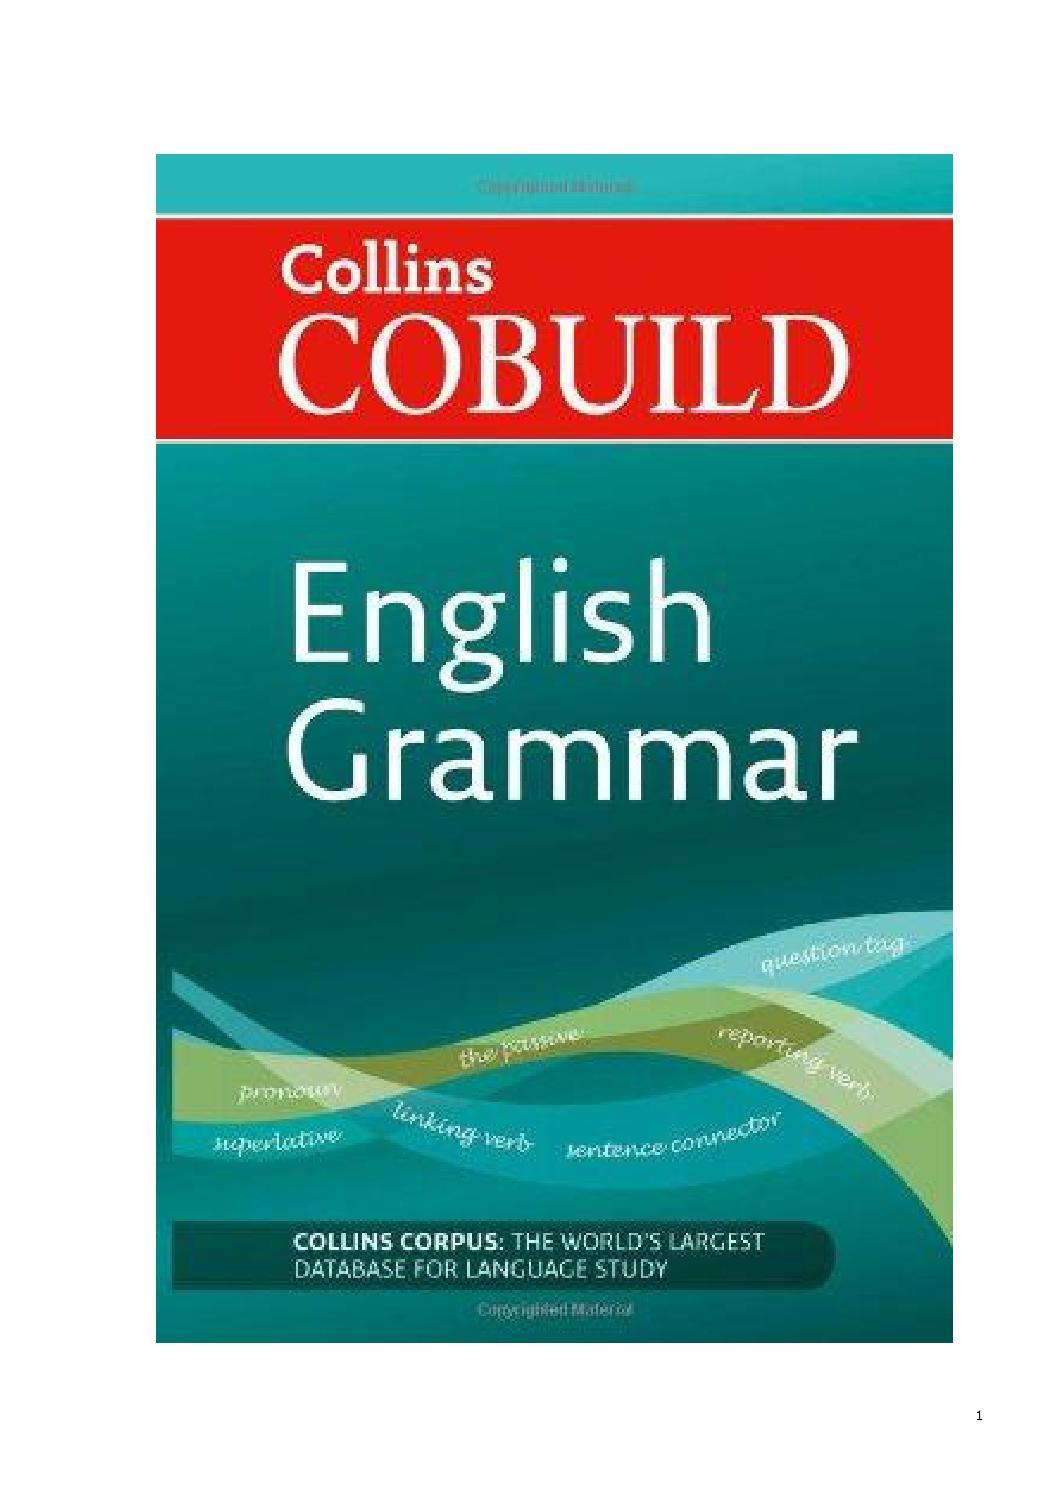 Collins cobuild english grammar by sallyf - issuu